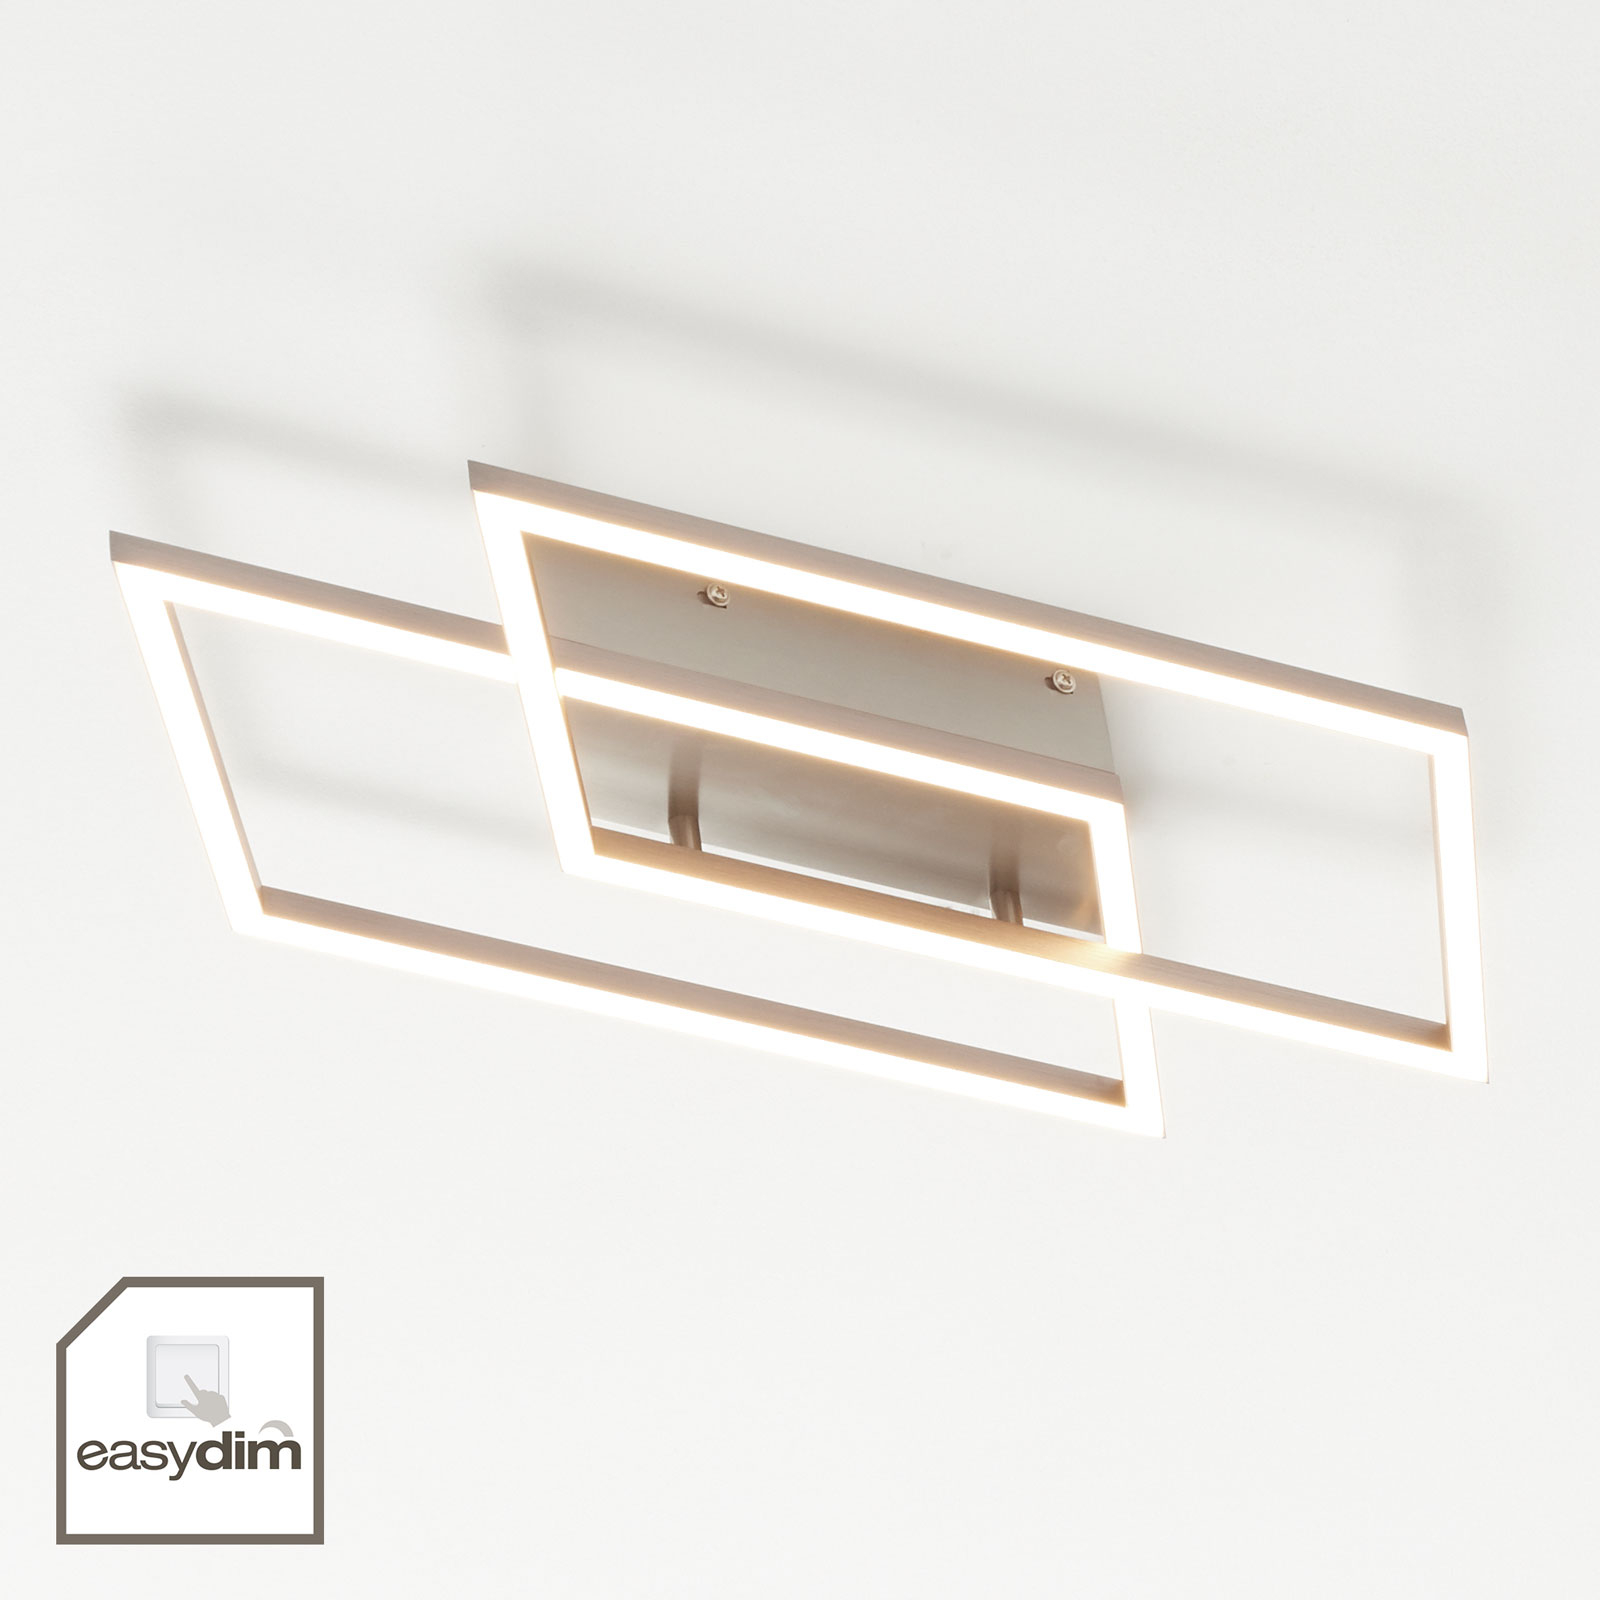 Kaksilamppuinen LED-kattovalaisin Inigo, 53,8 cm